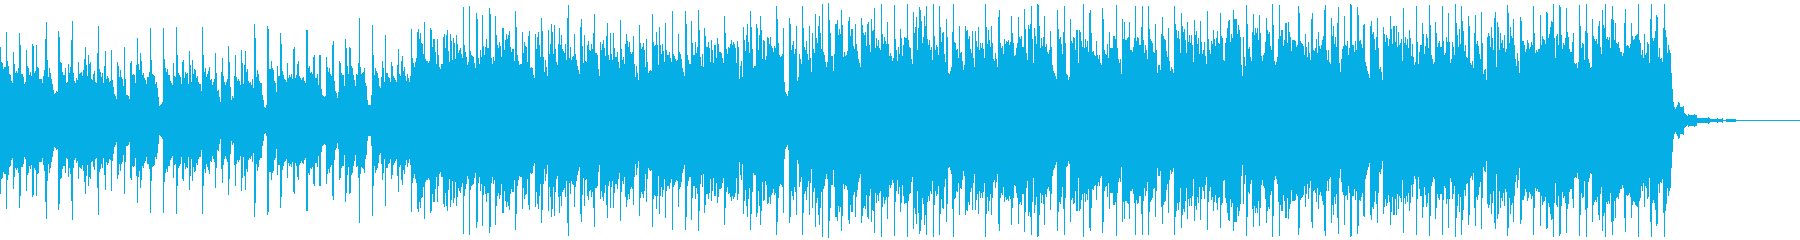 Piano House 3の再生済みの波形